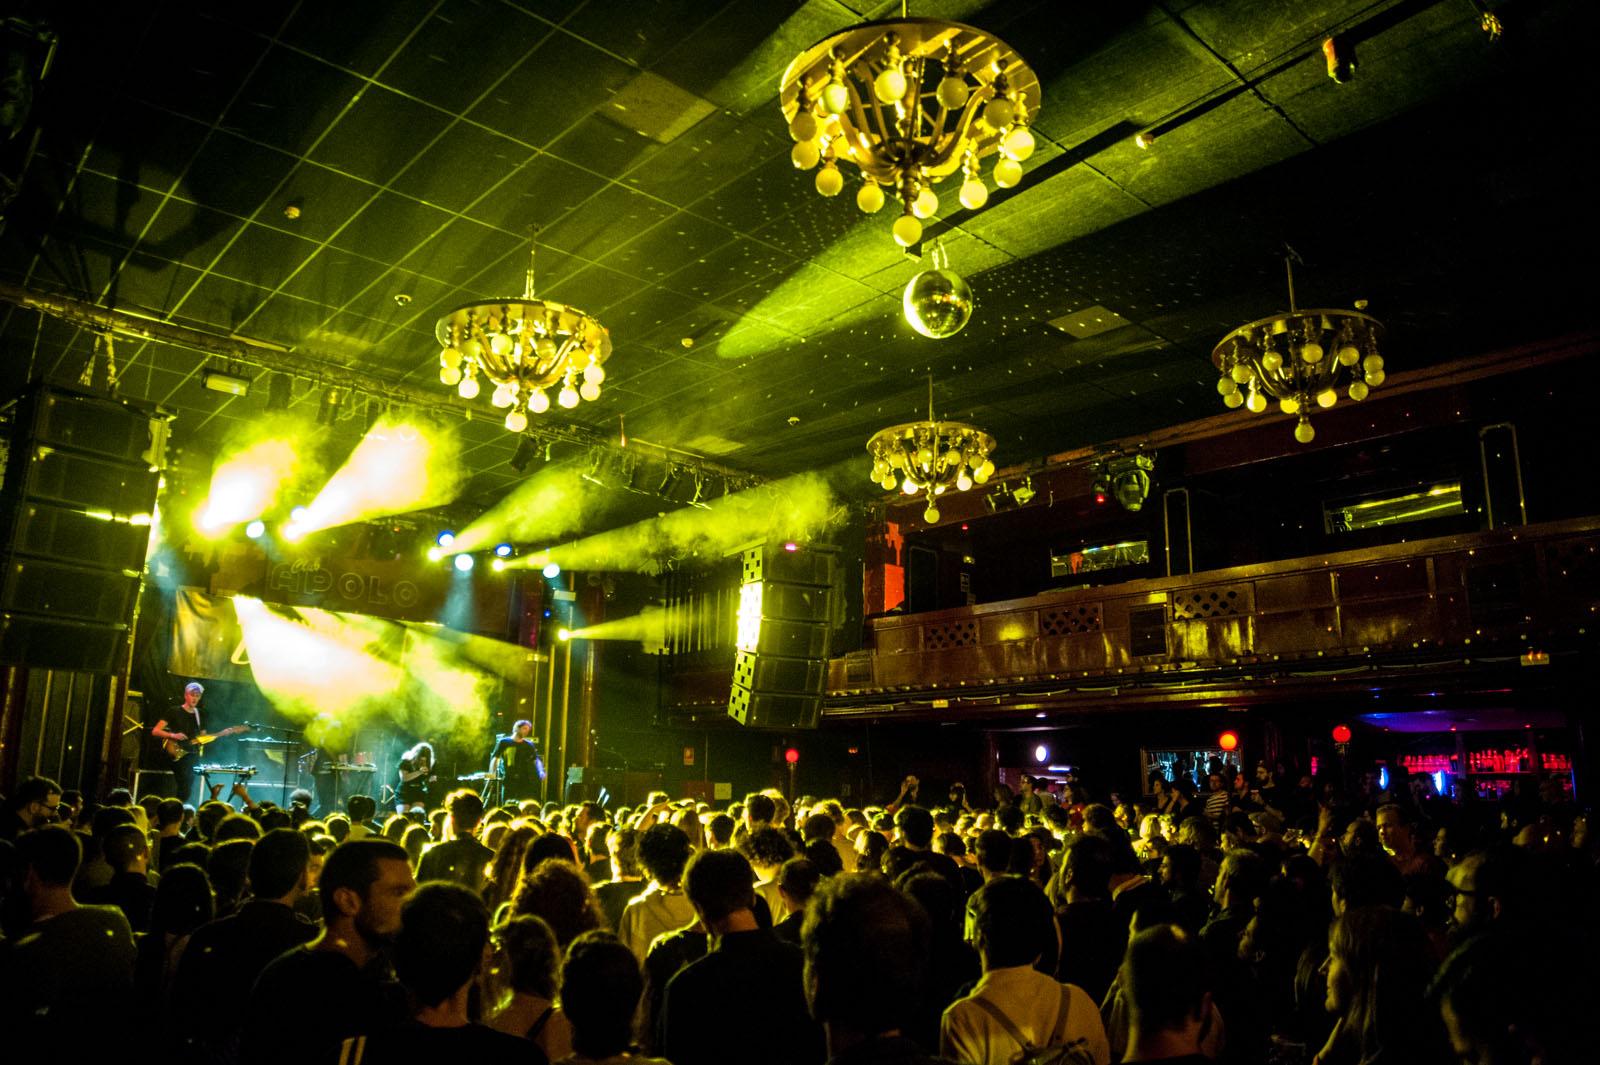 concert-yumi-zouma-primavera-club-sala-apolo-barcelona-qualsevol-nit